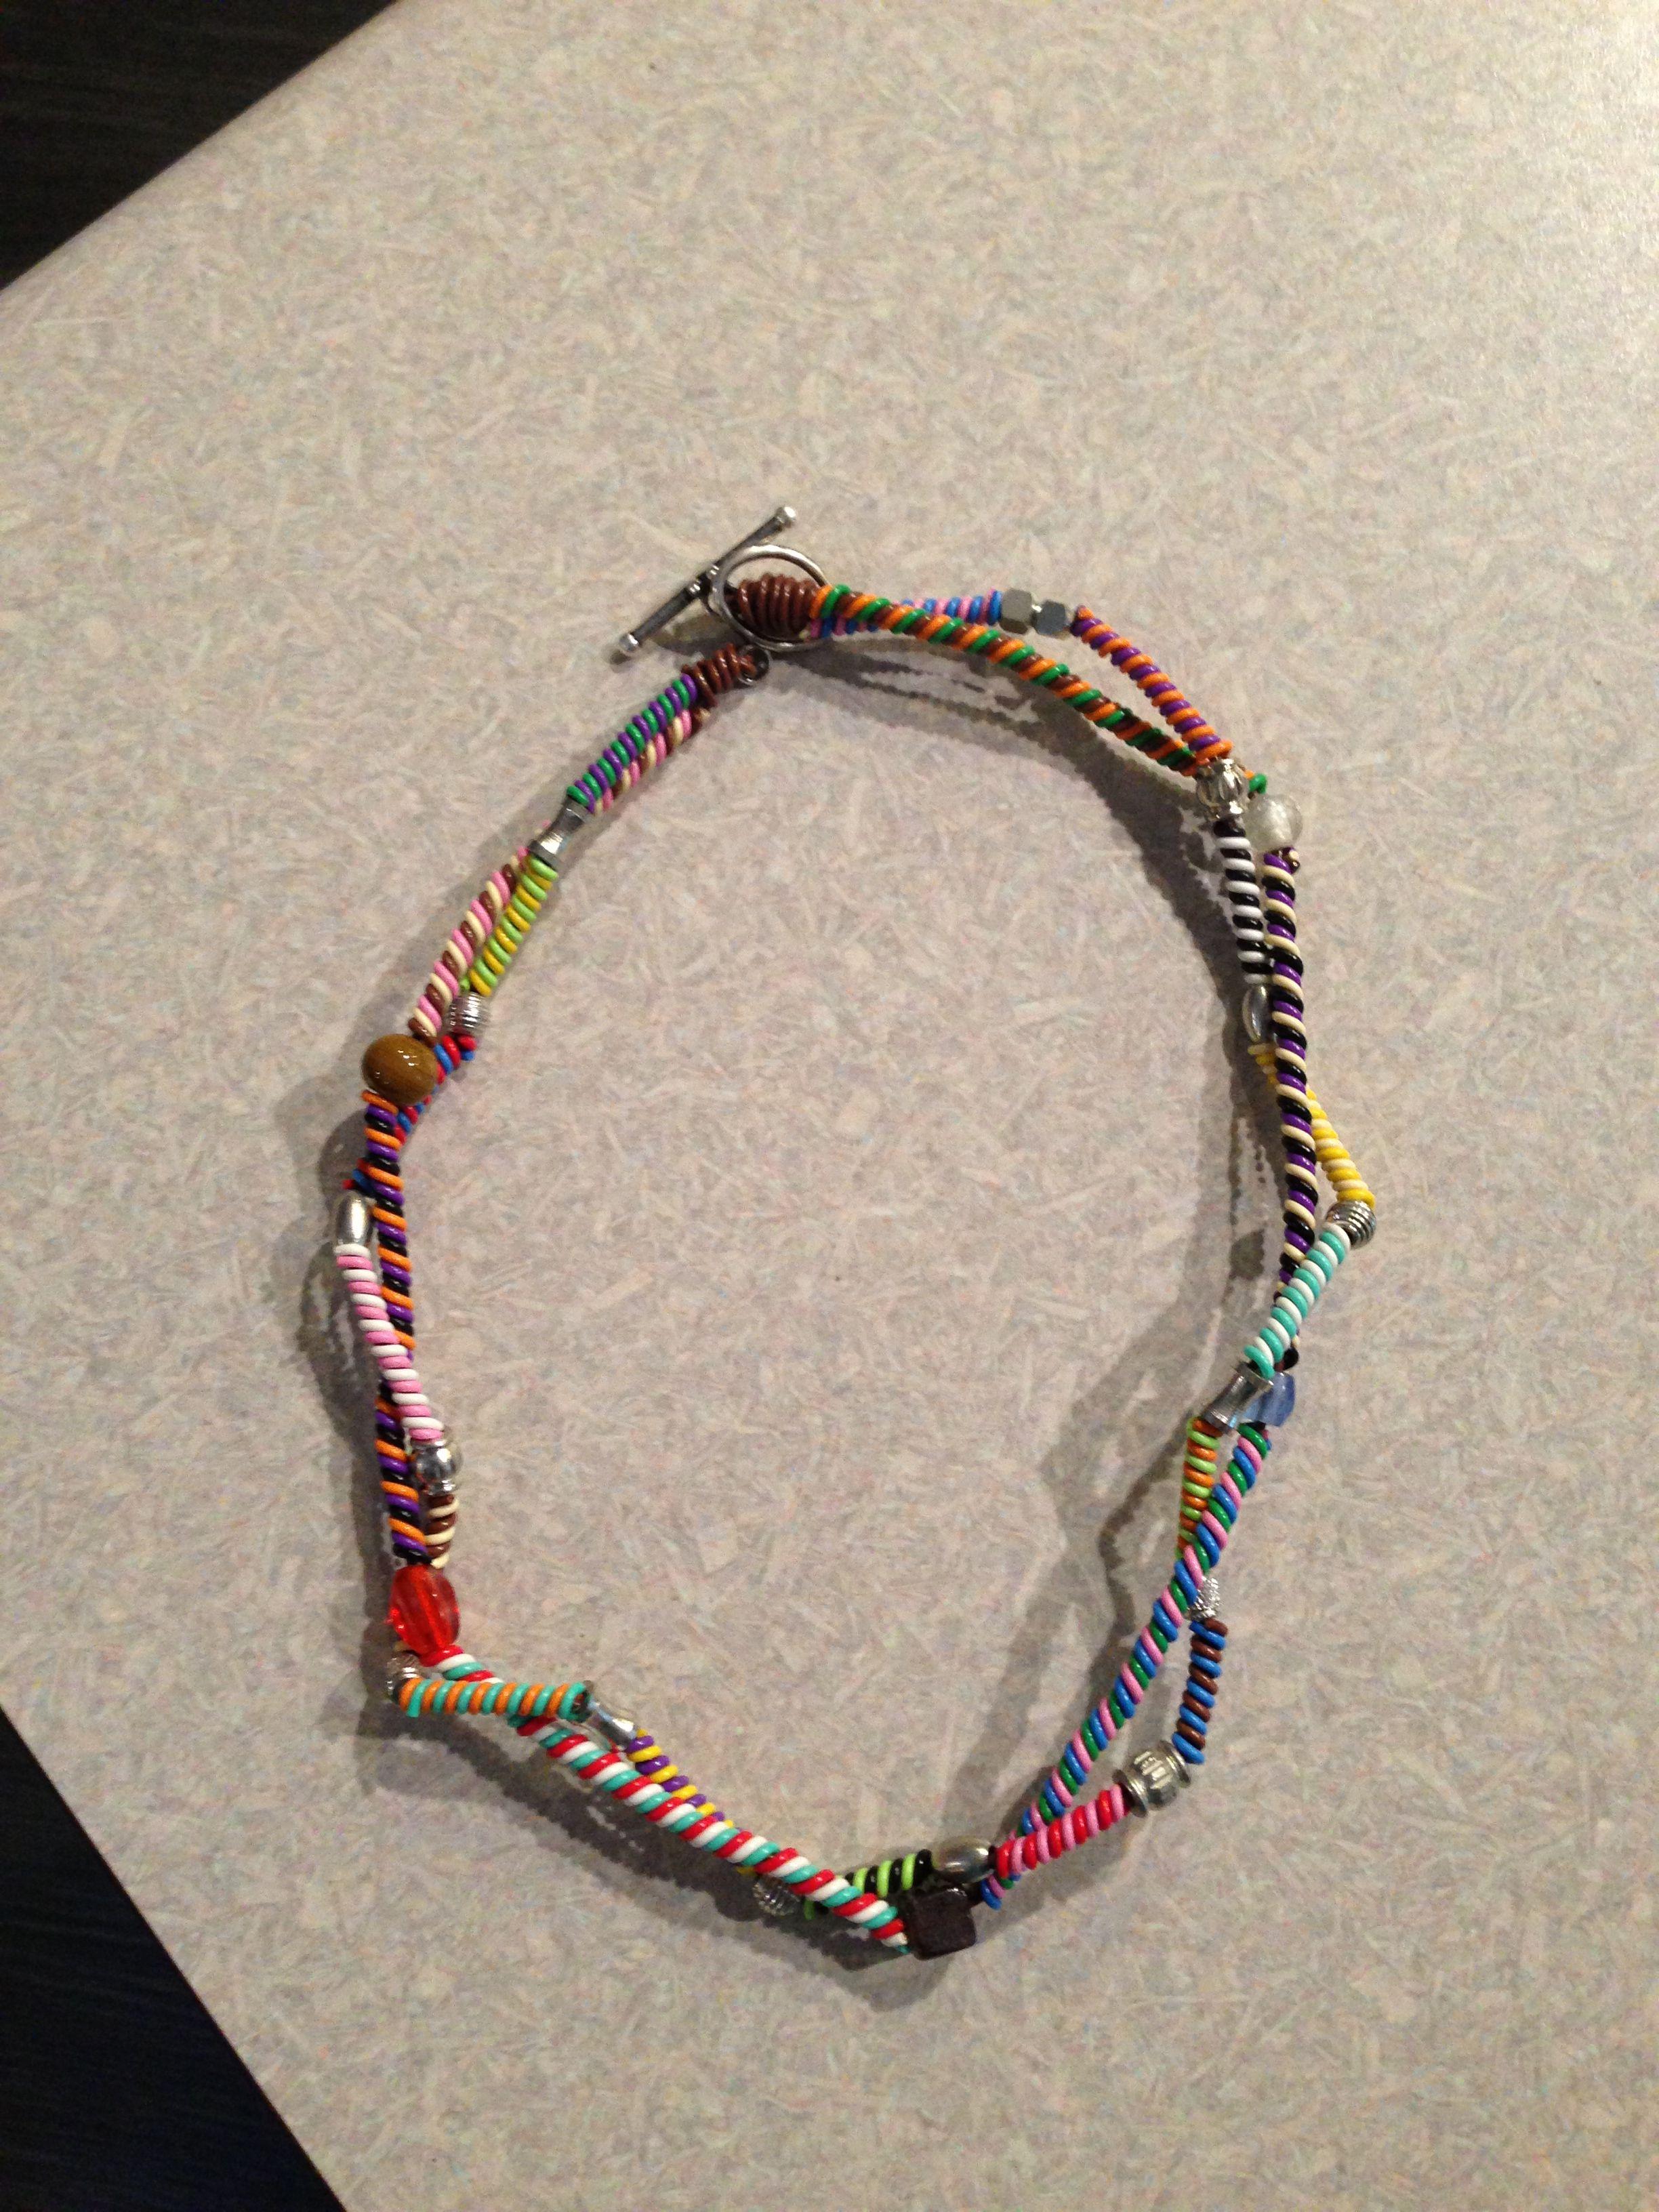 Phone wire jewelry